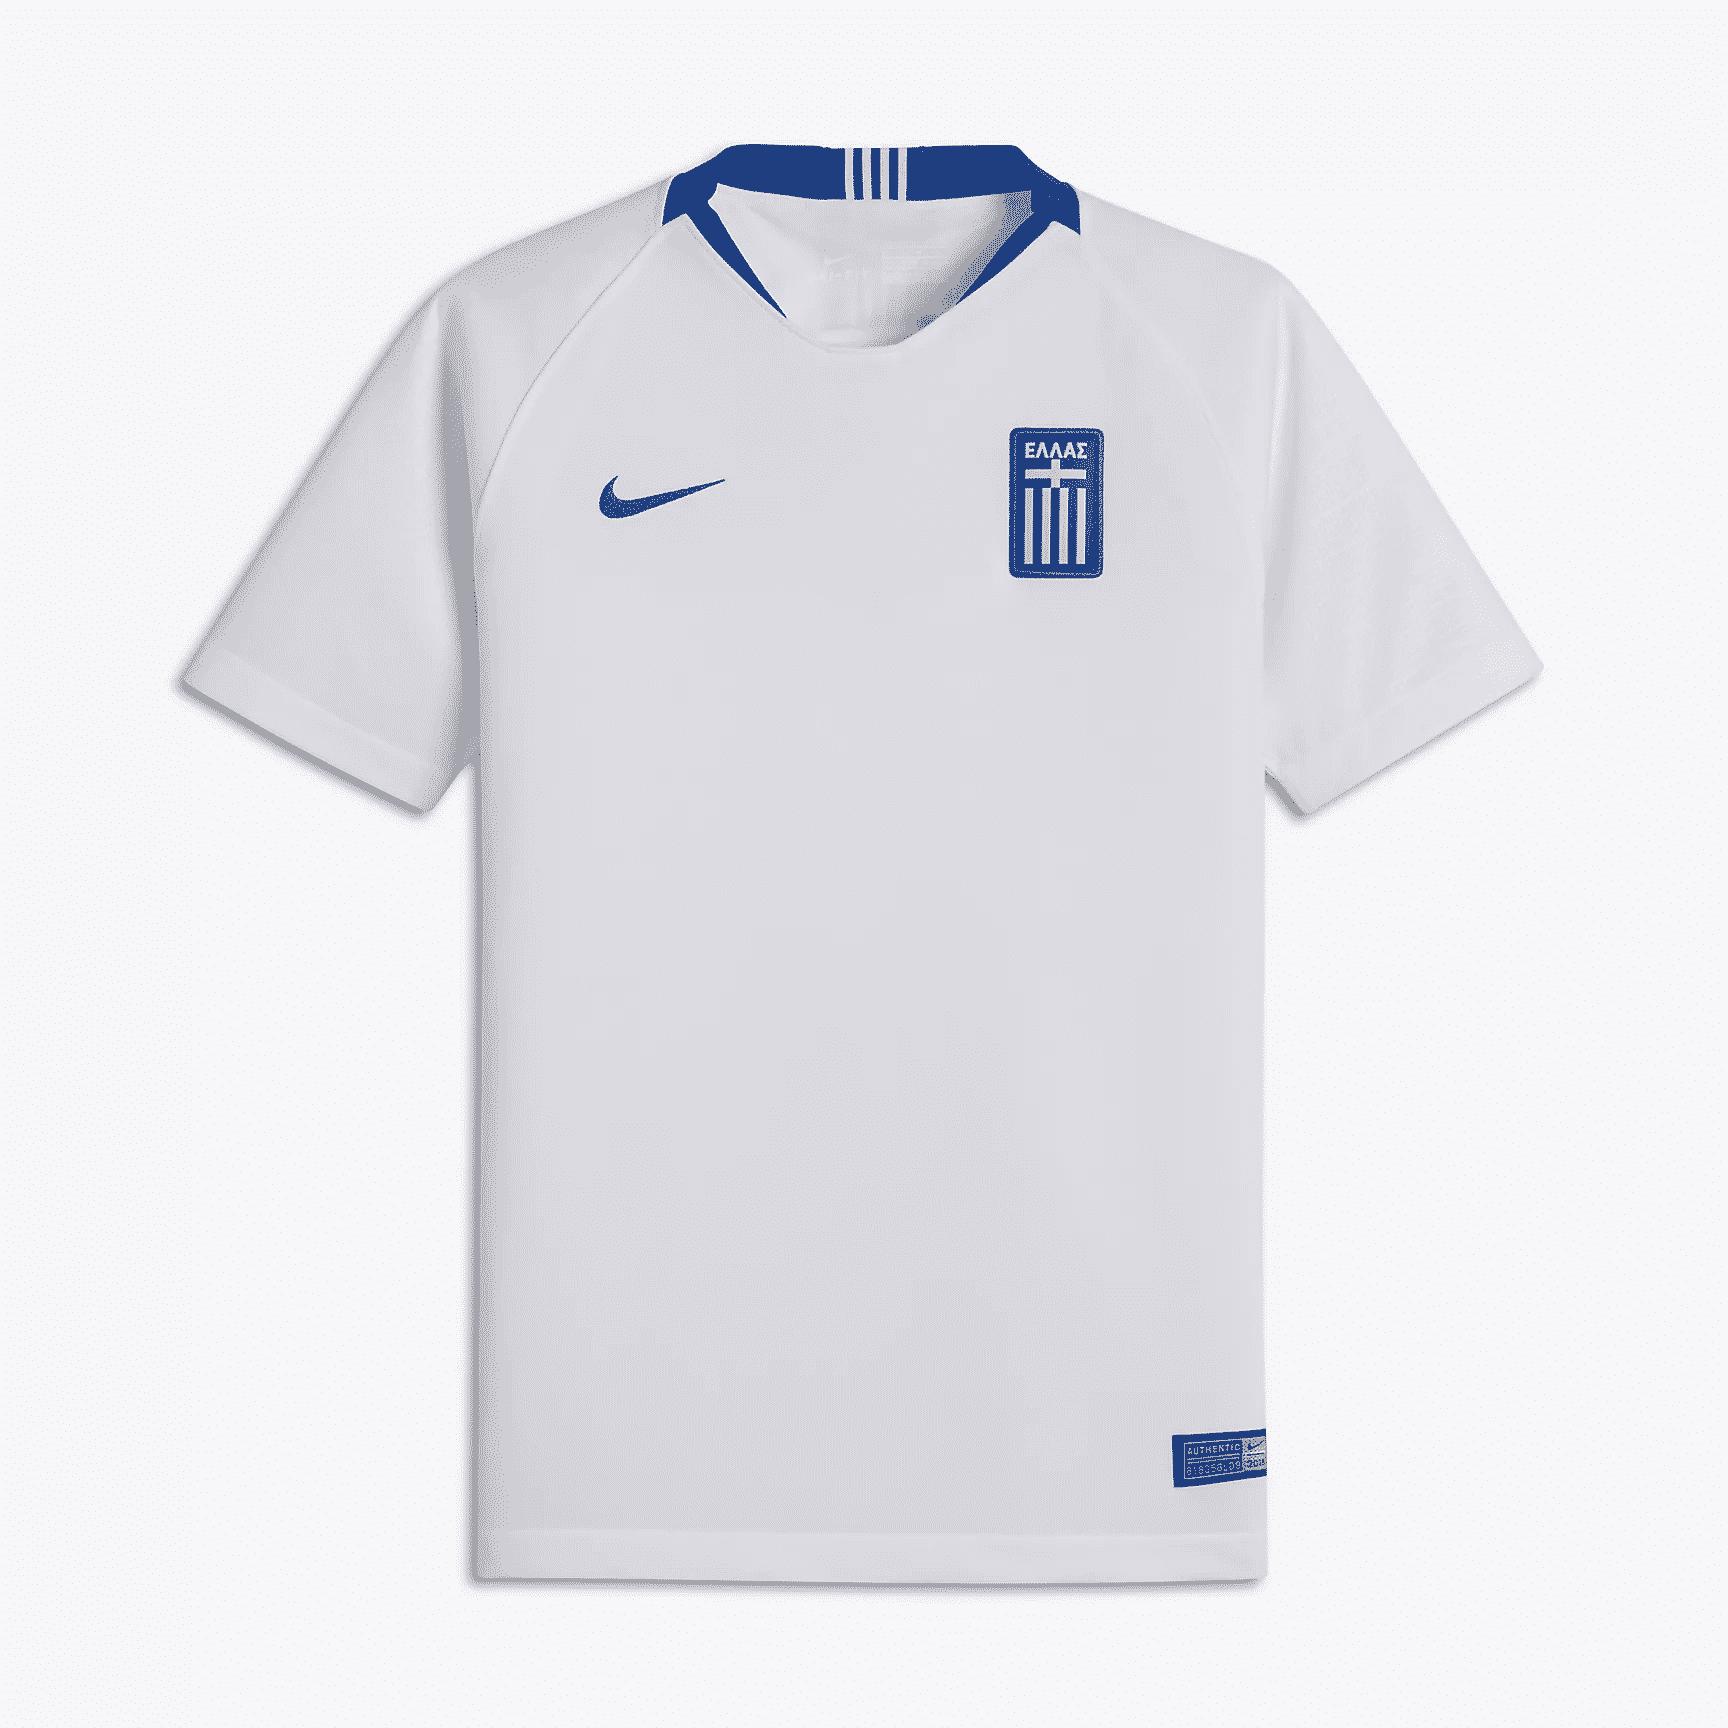 maillot-exterieur-grece-2018-nike